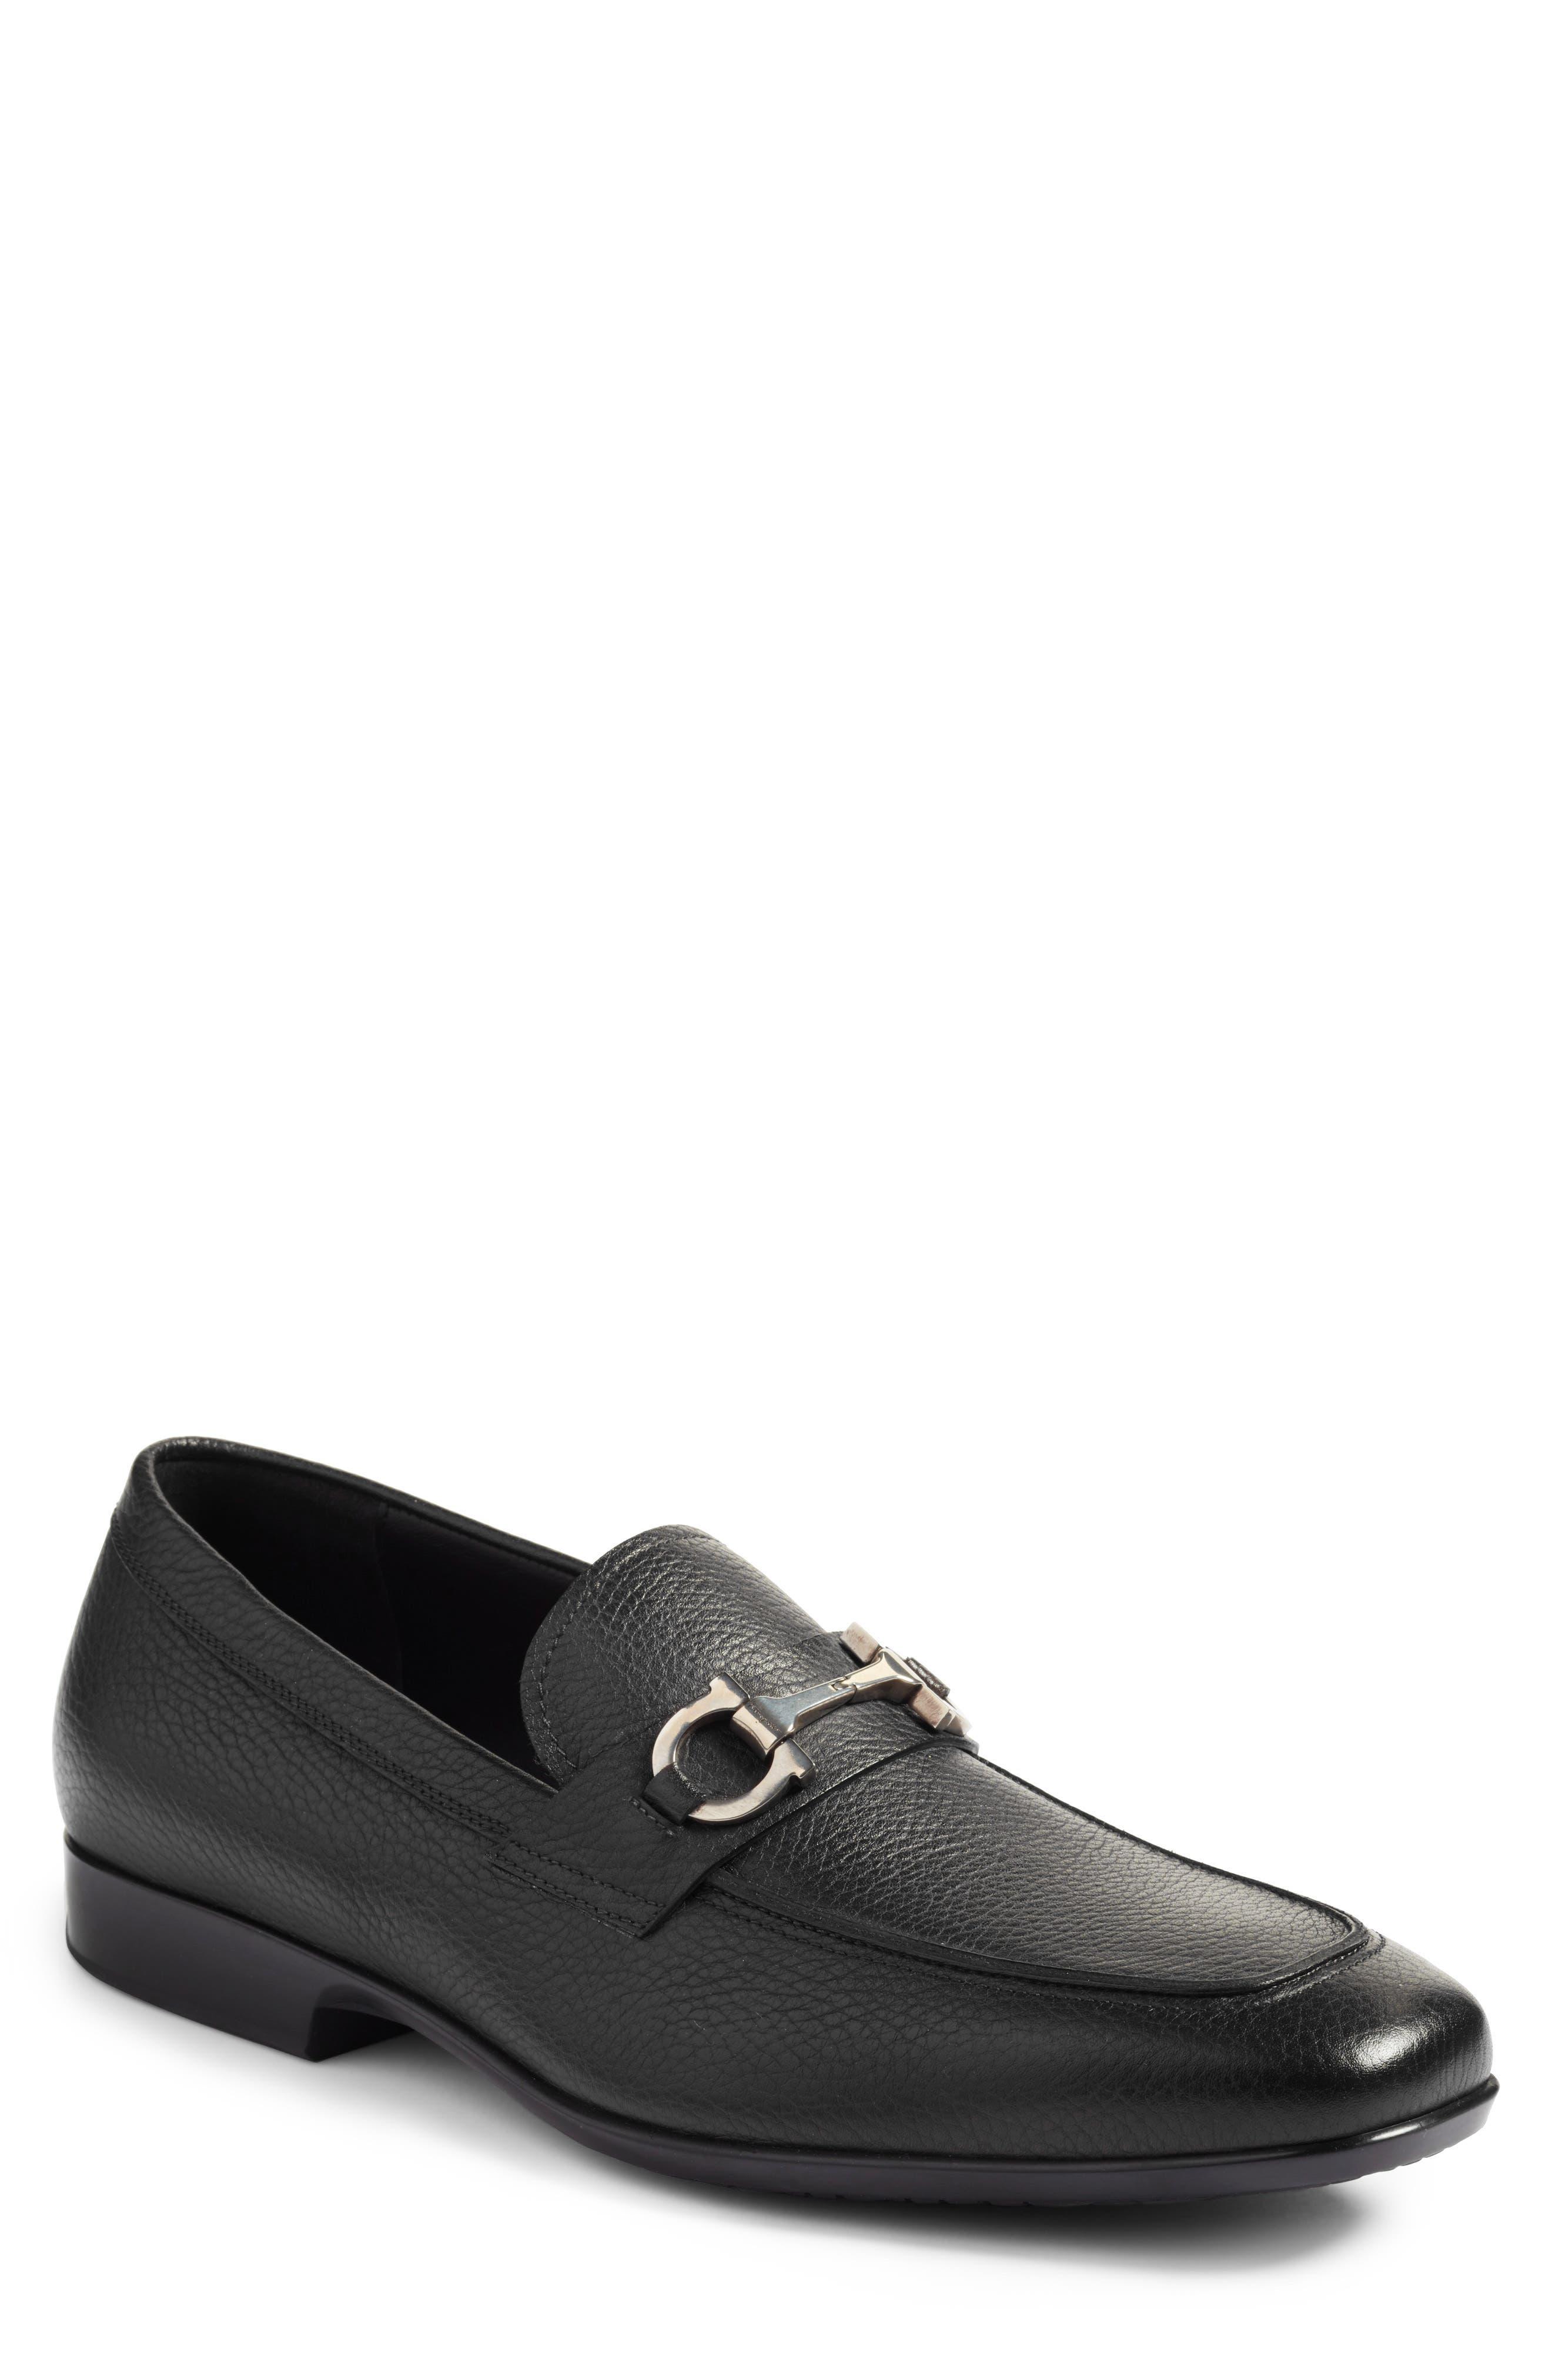 Salvatore Ferragamo Men S Shoes Nordstrom